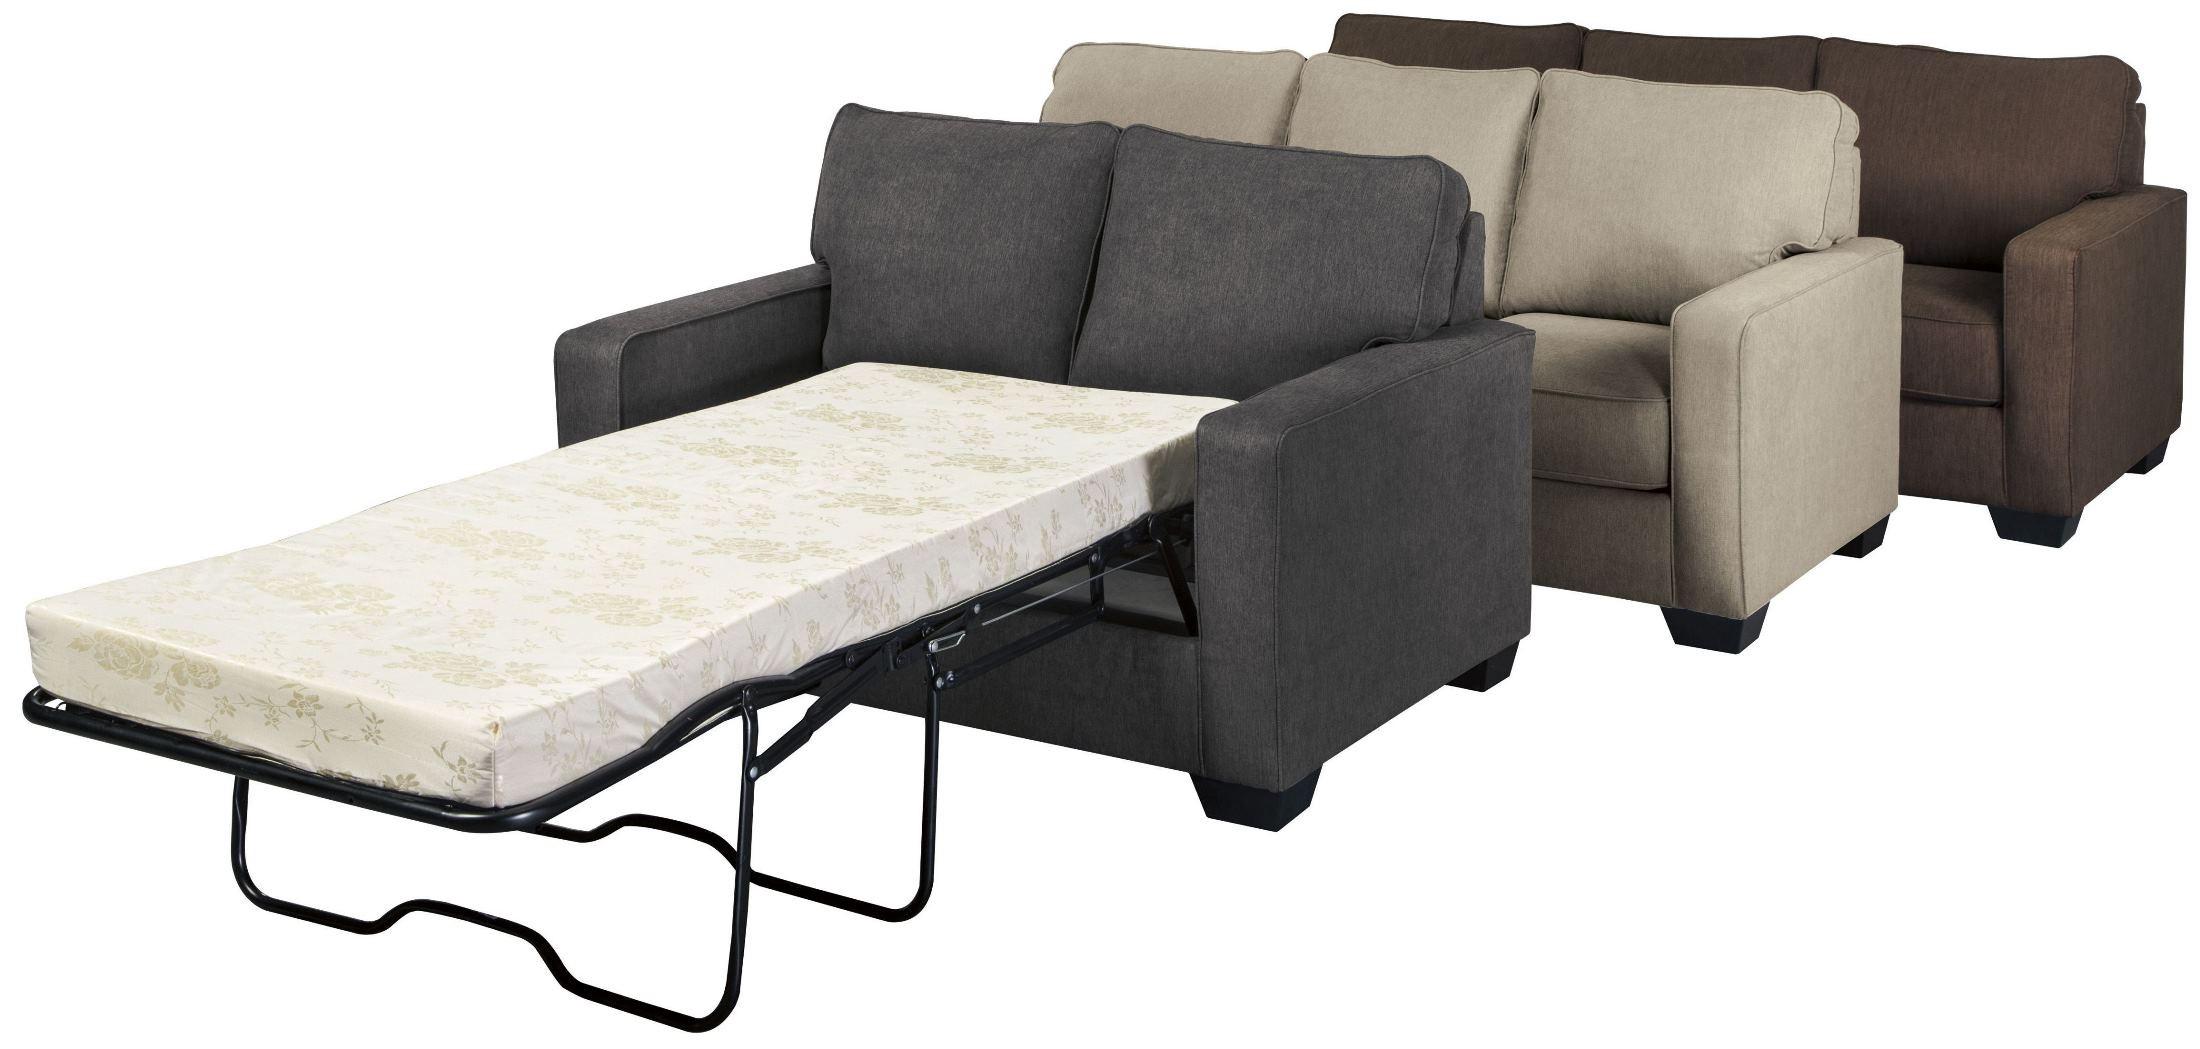 zeb espresso twin sofa sleeper 3590337 ashley. Black Bedroom Furniture Sets. Home Design Ideas